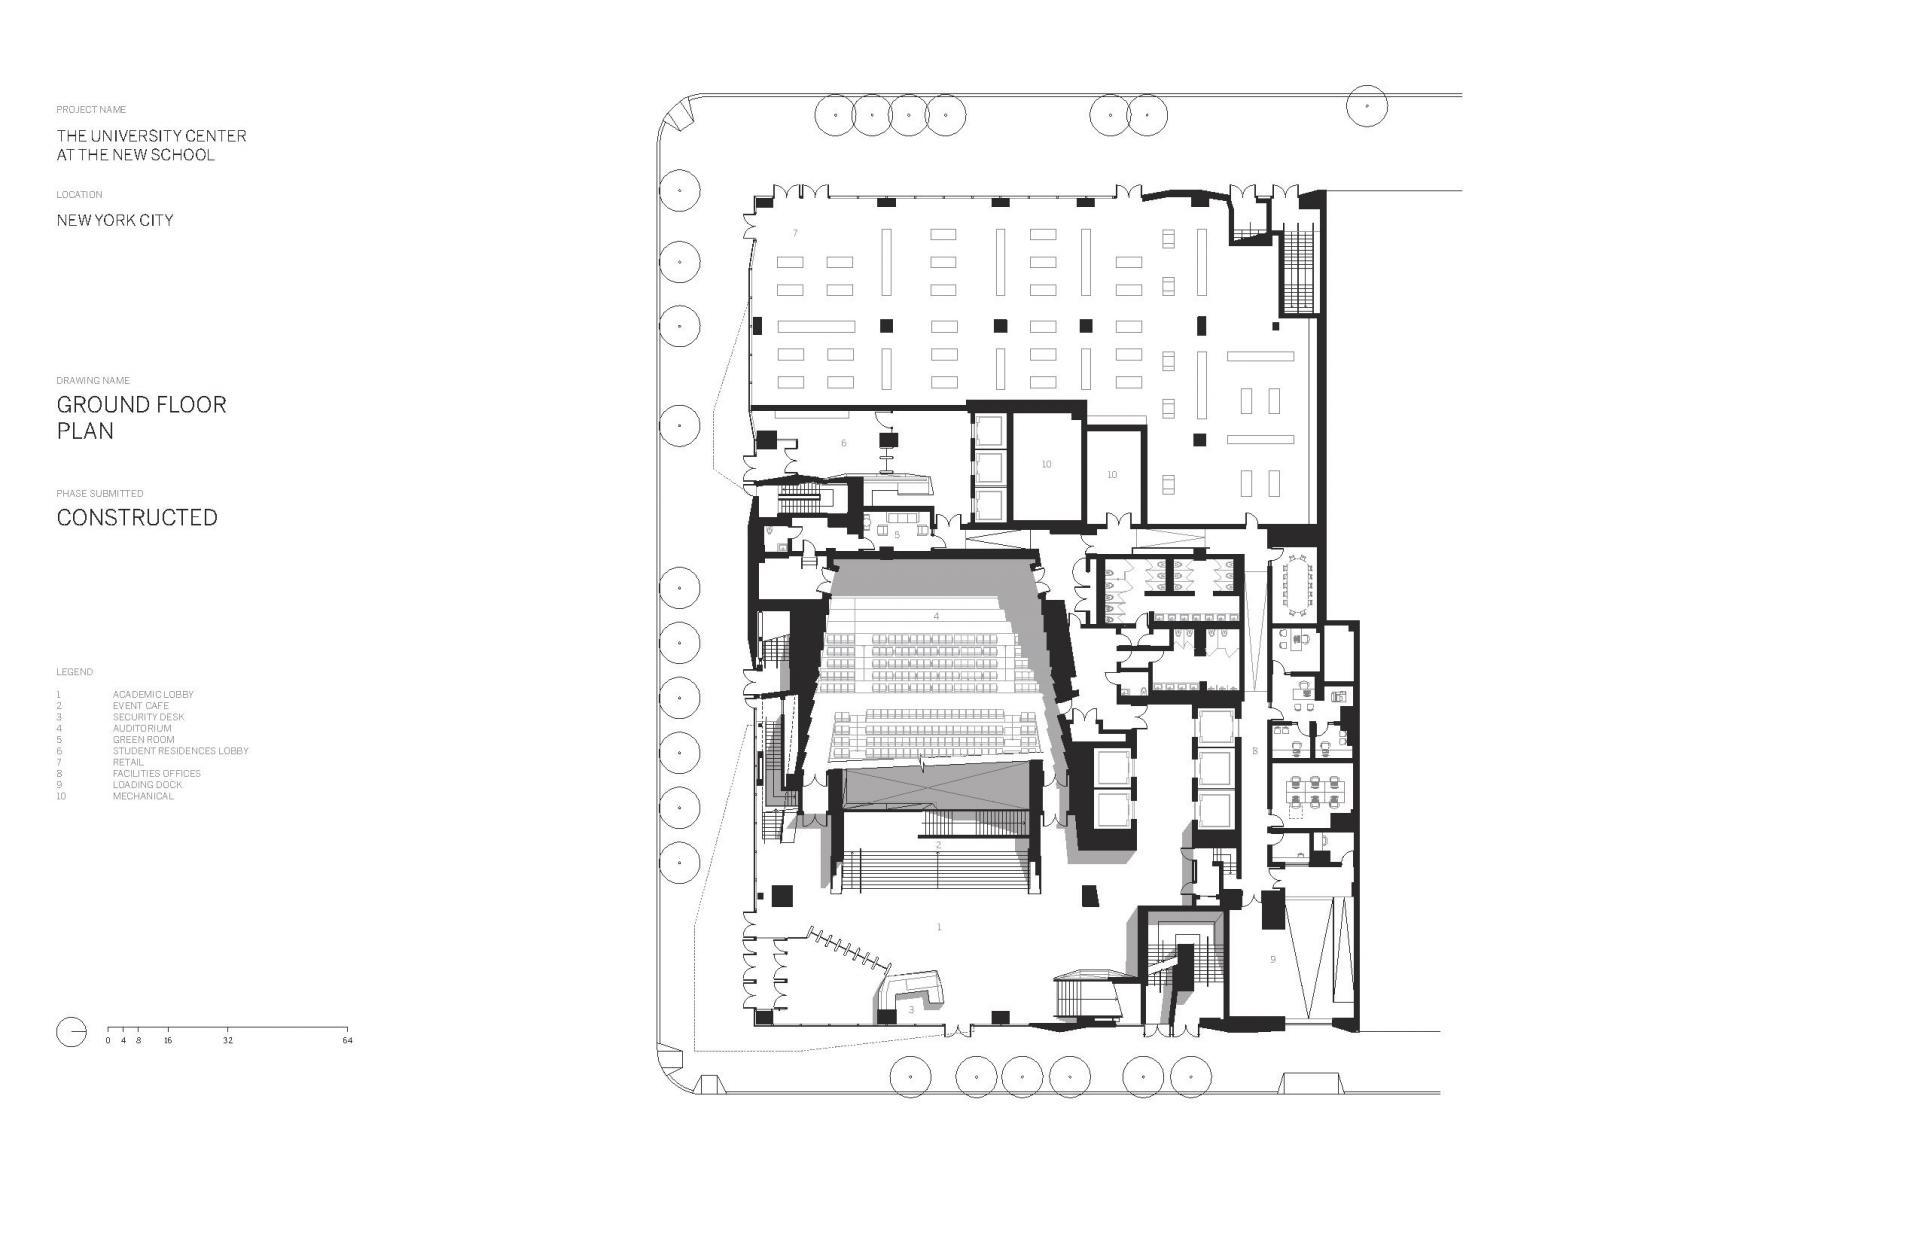 Схема учебного центра Greenwich Village в Нью Йорке - Фото 3